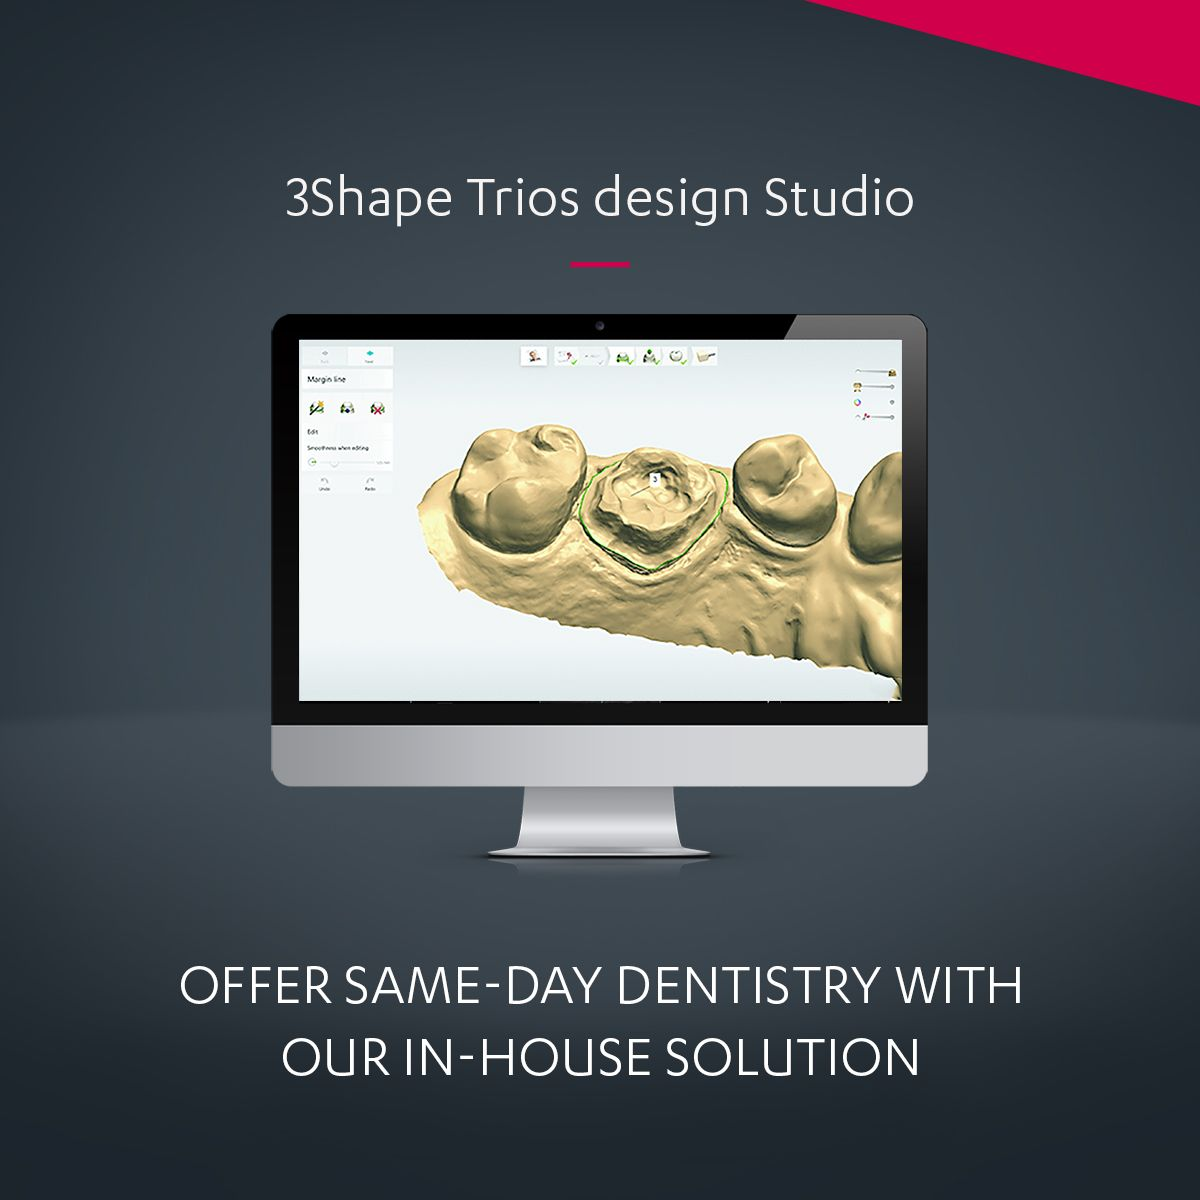 3Shape TRIOS Design Studio – Your Chairside CAD/CAM Solution